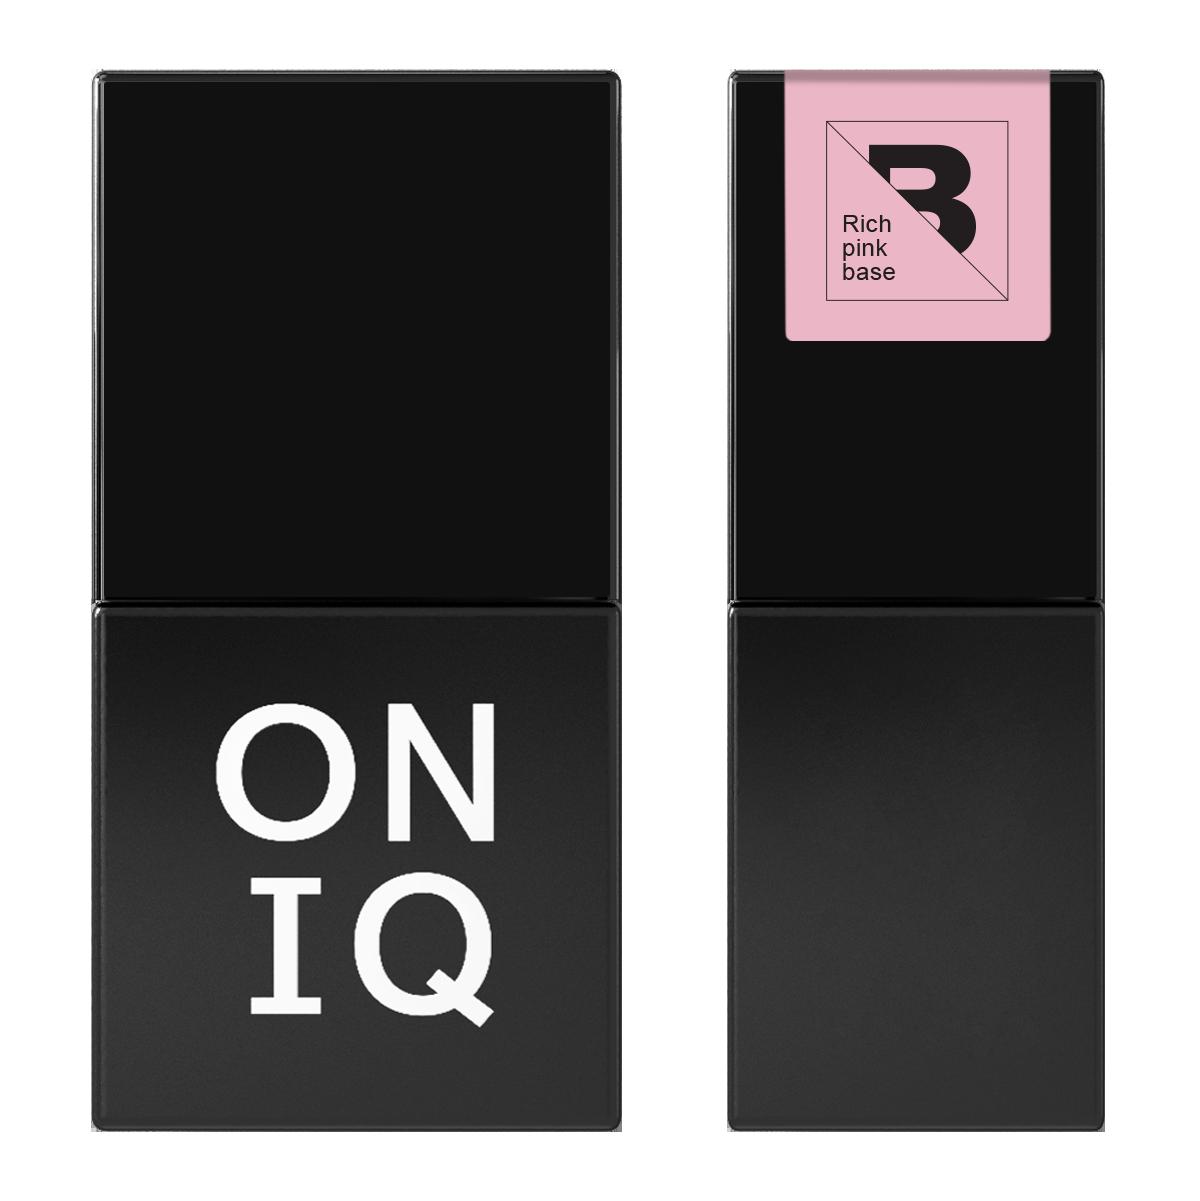 Гель лак Oniq Базовое покрытие Rich pink